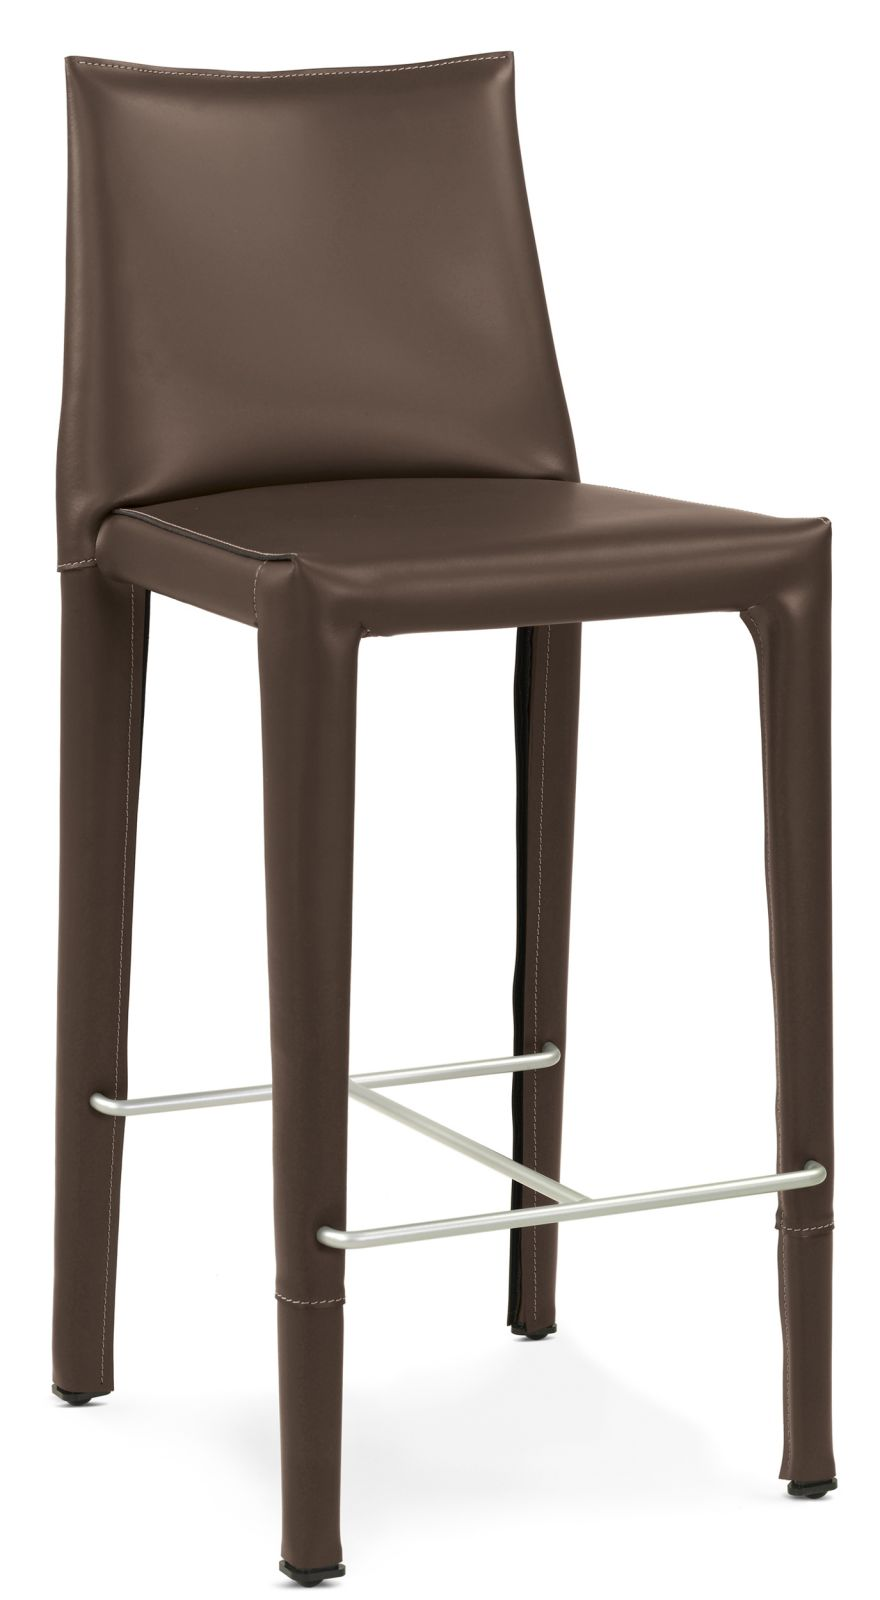 modern-bar-stools-Italian-furniture-large (16).jpg